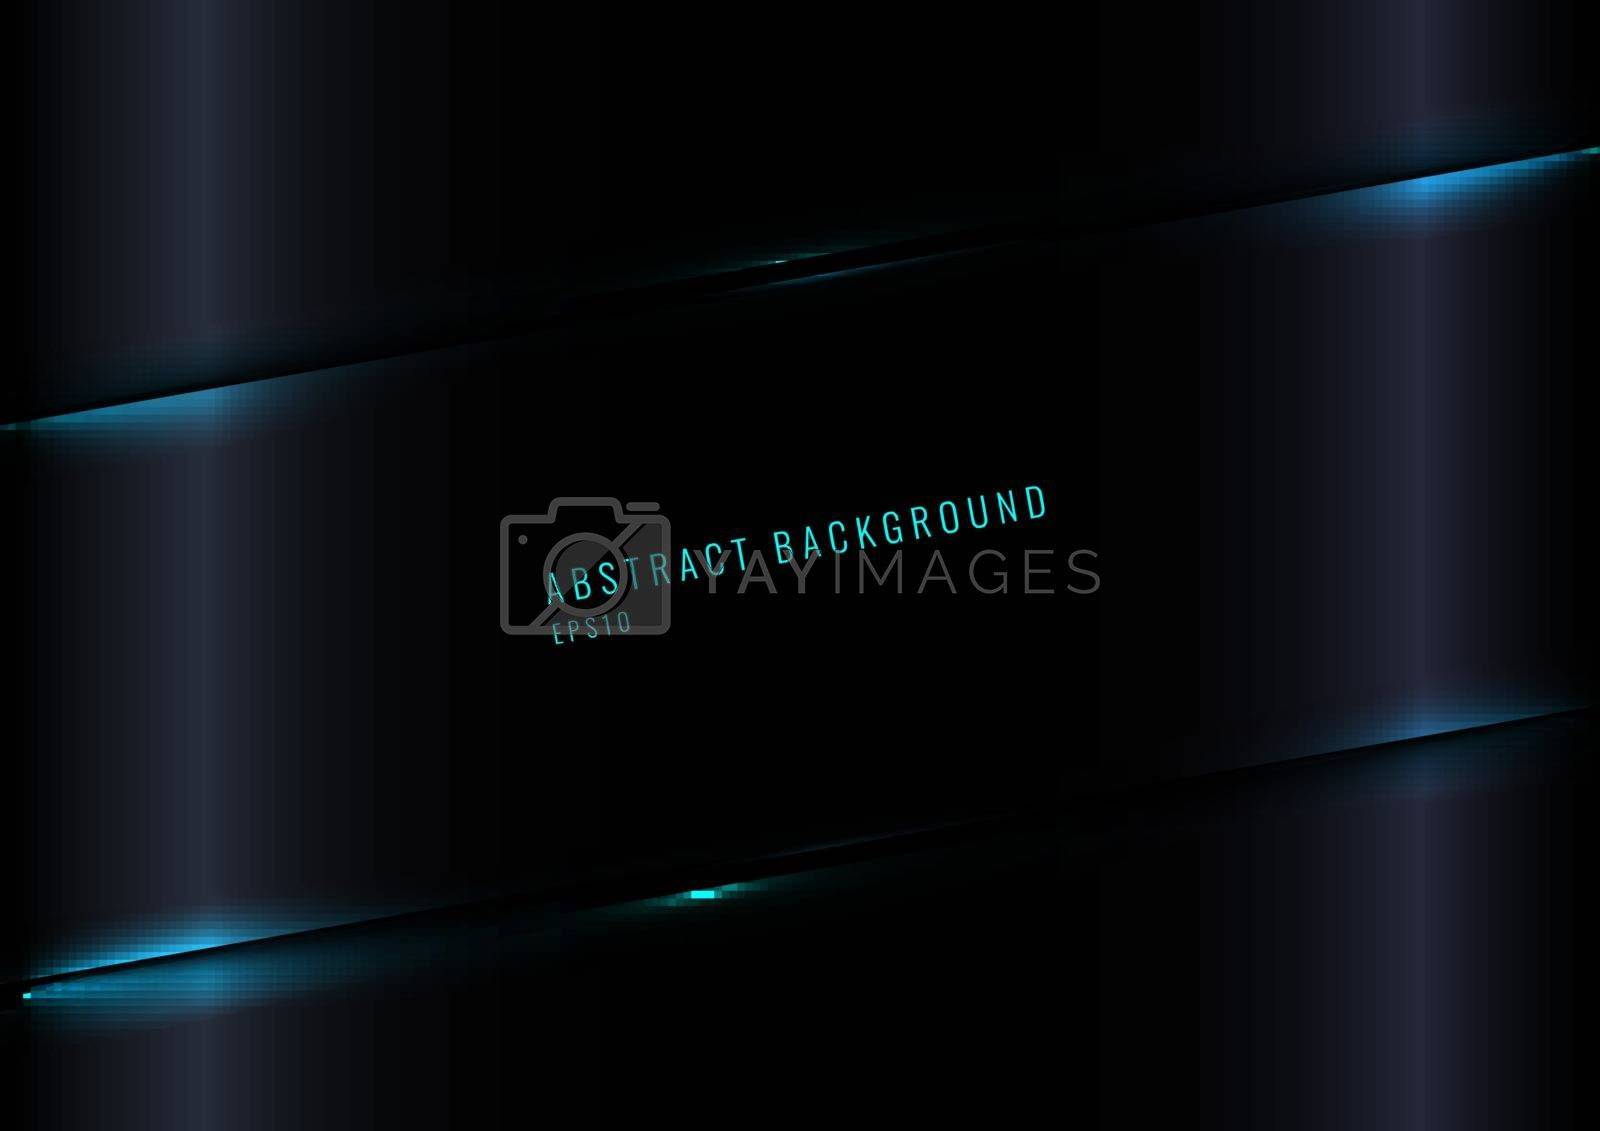 Modern Black Glossy Gradient Color Background with Blue Laser Lighting Effect. Vector Illustration